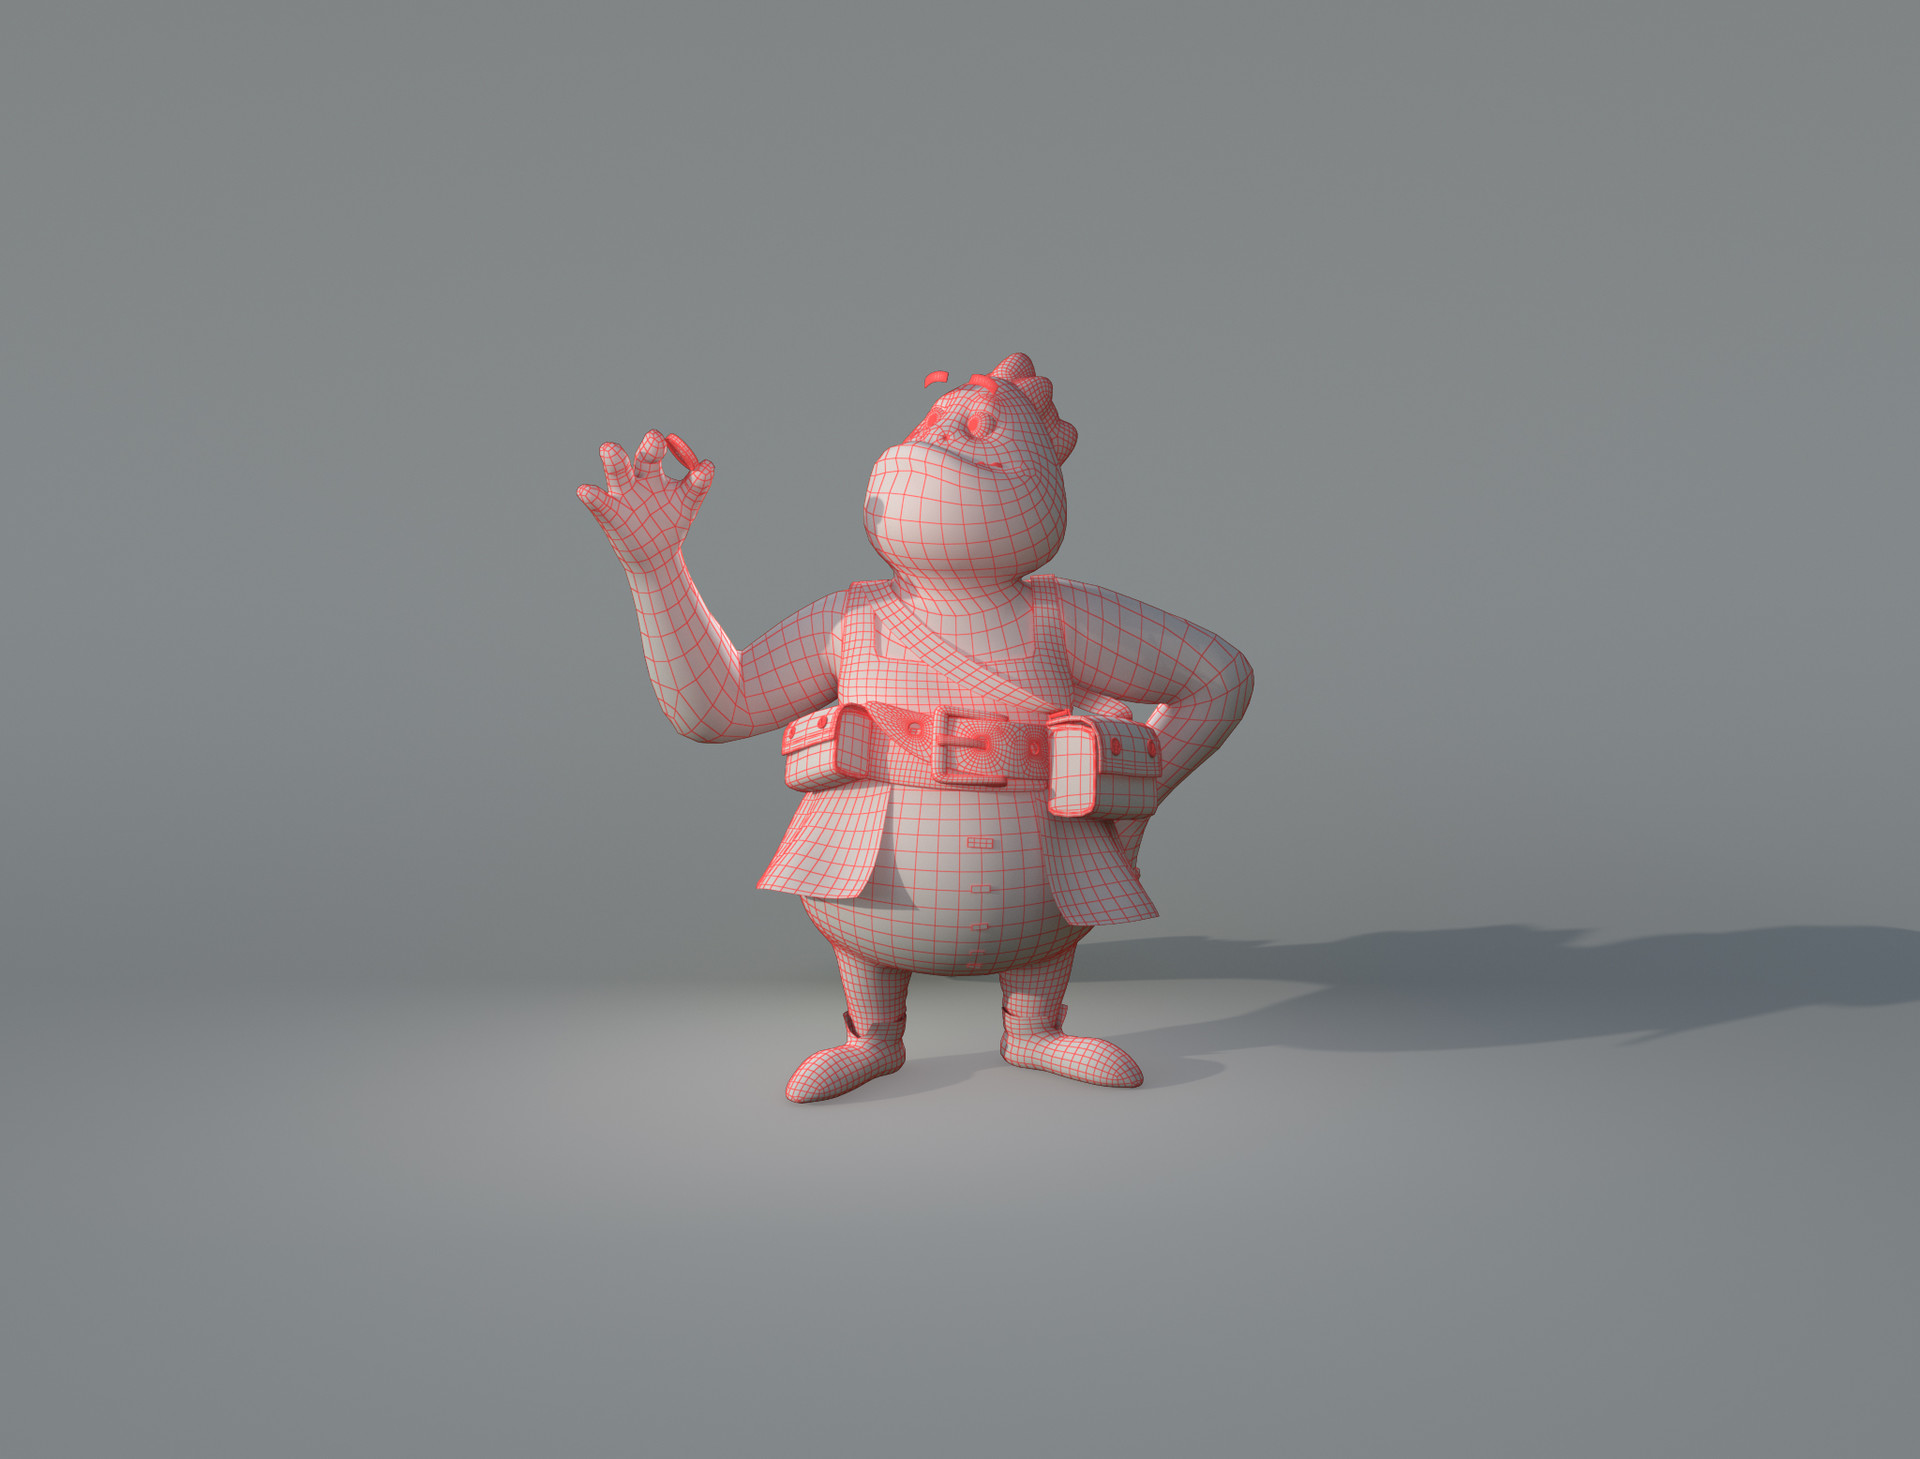 39a53fb5a6926 ArtStation - Froggo The Salesman